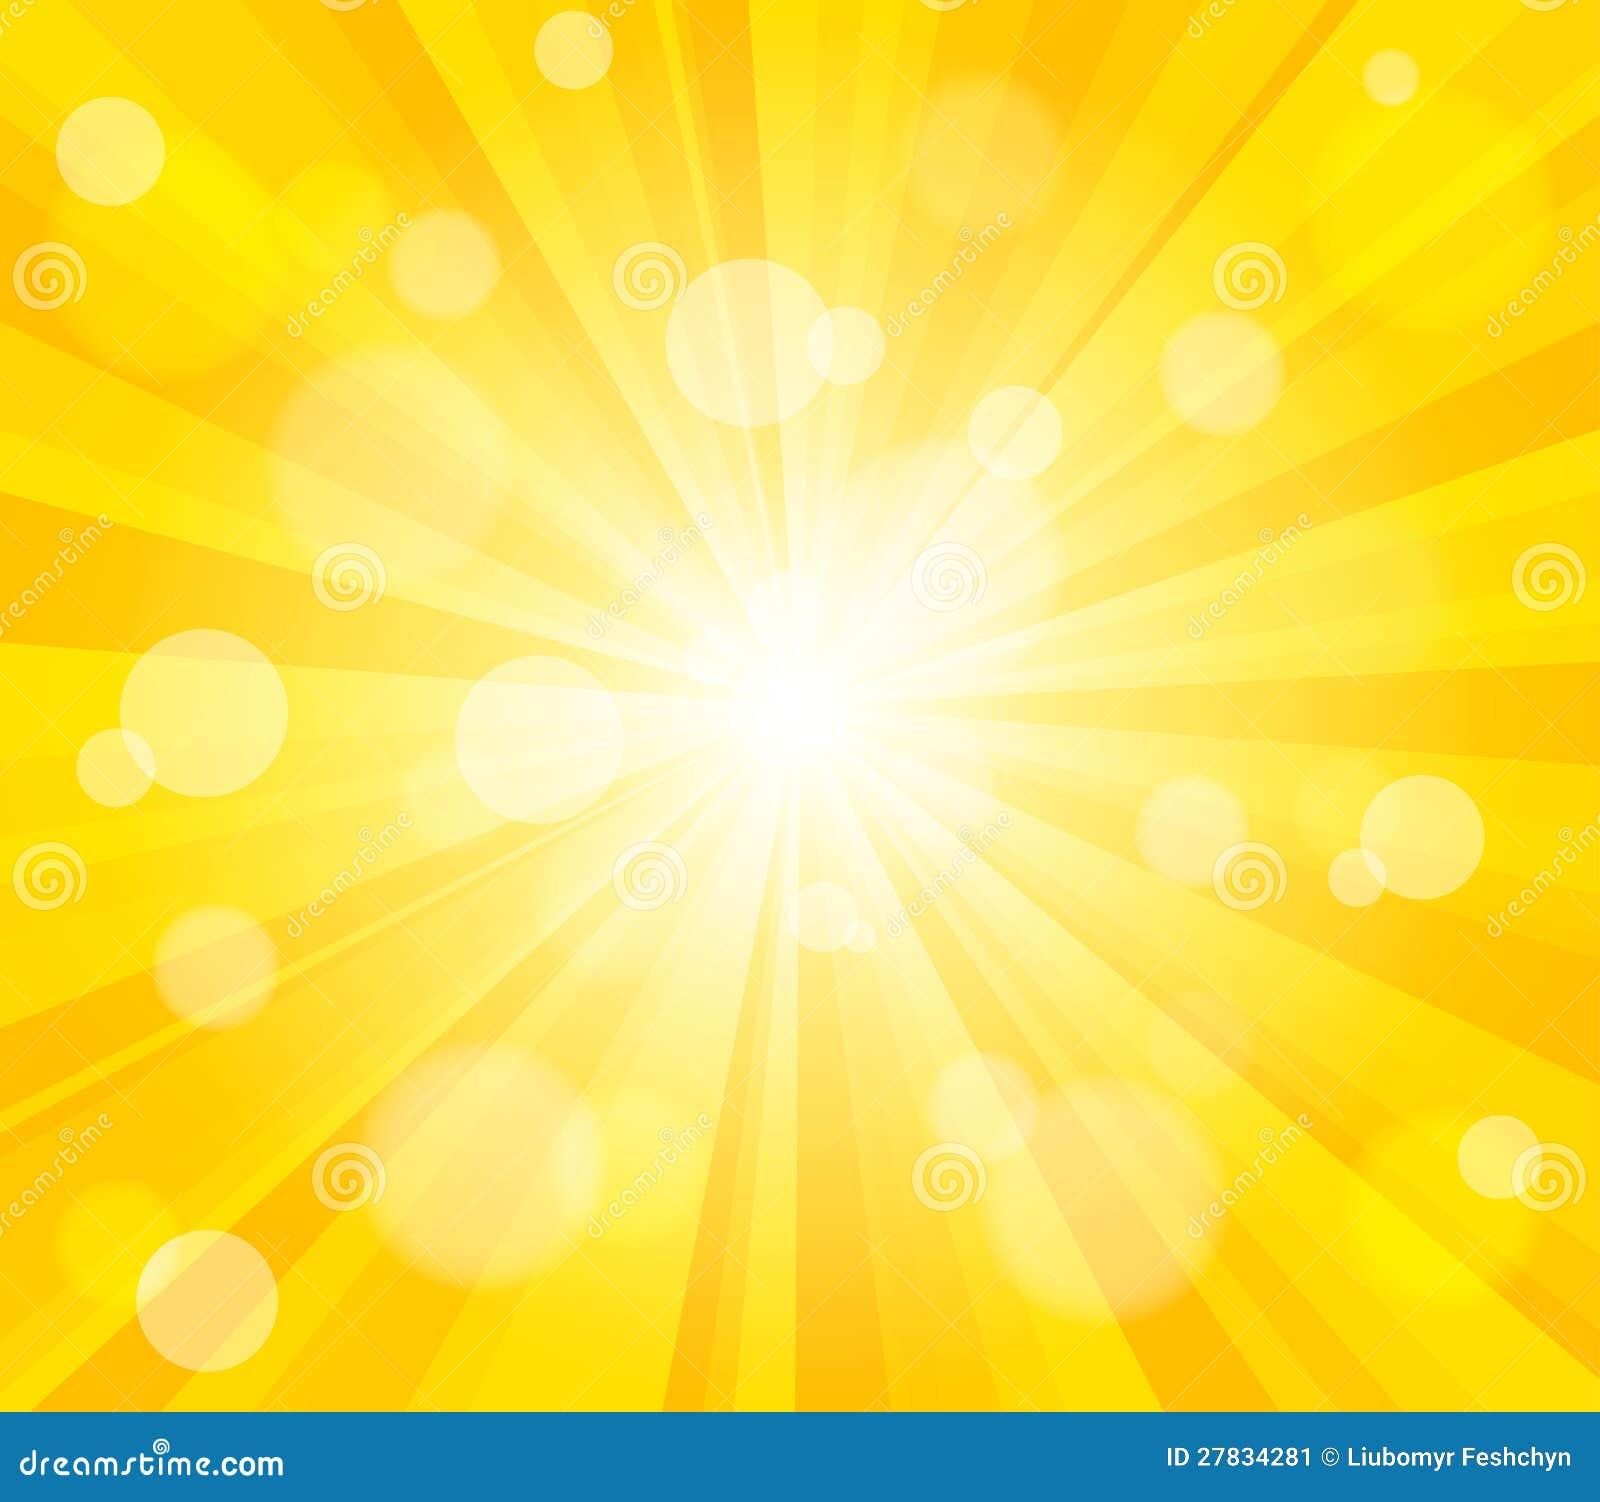 Bright Vector Sun Effect Background Illustration 27834281 - Megapixl